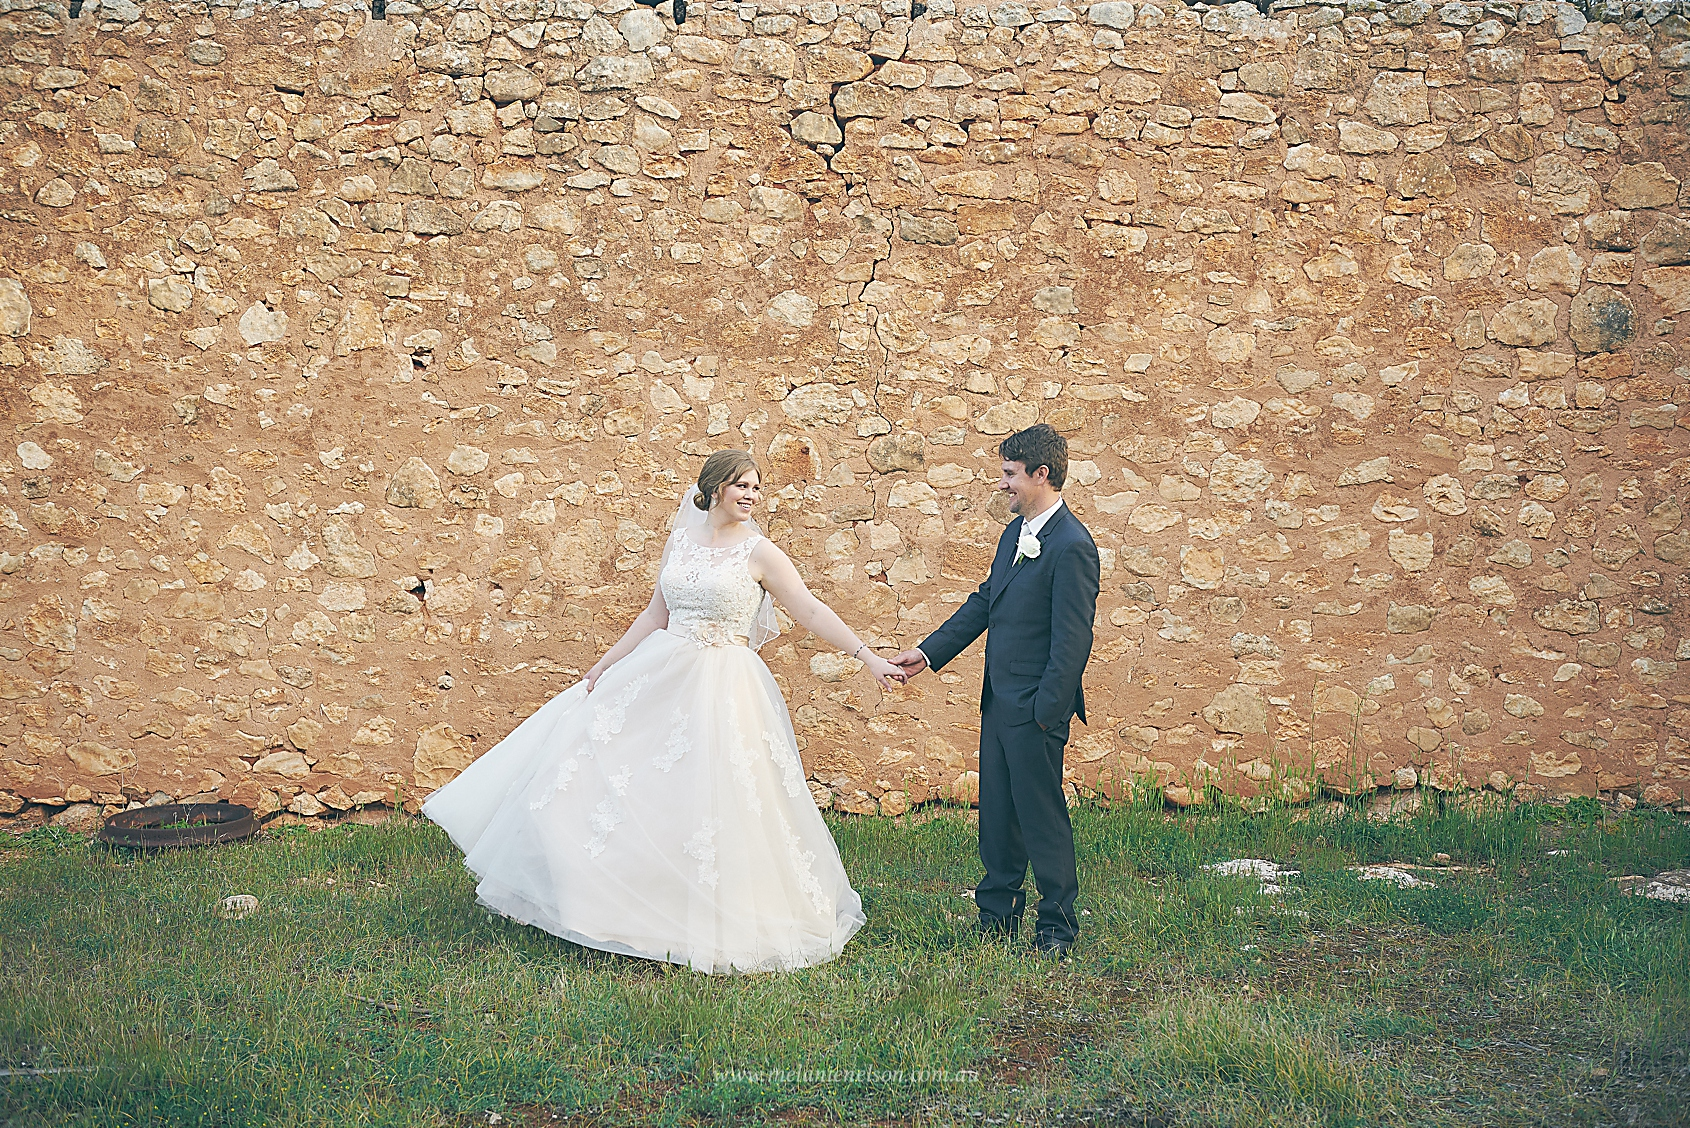 yorke_peninsula_wedding_photographer_0089.jpg